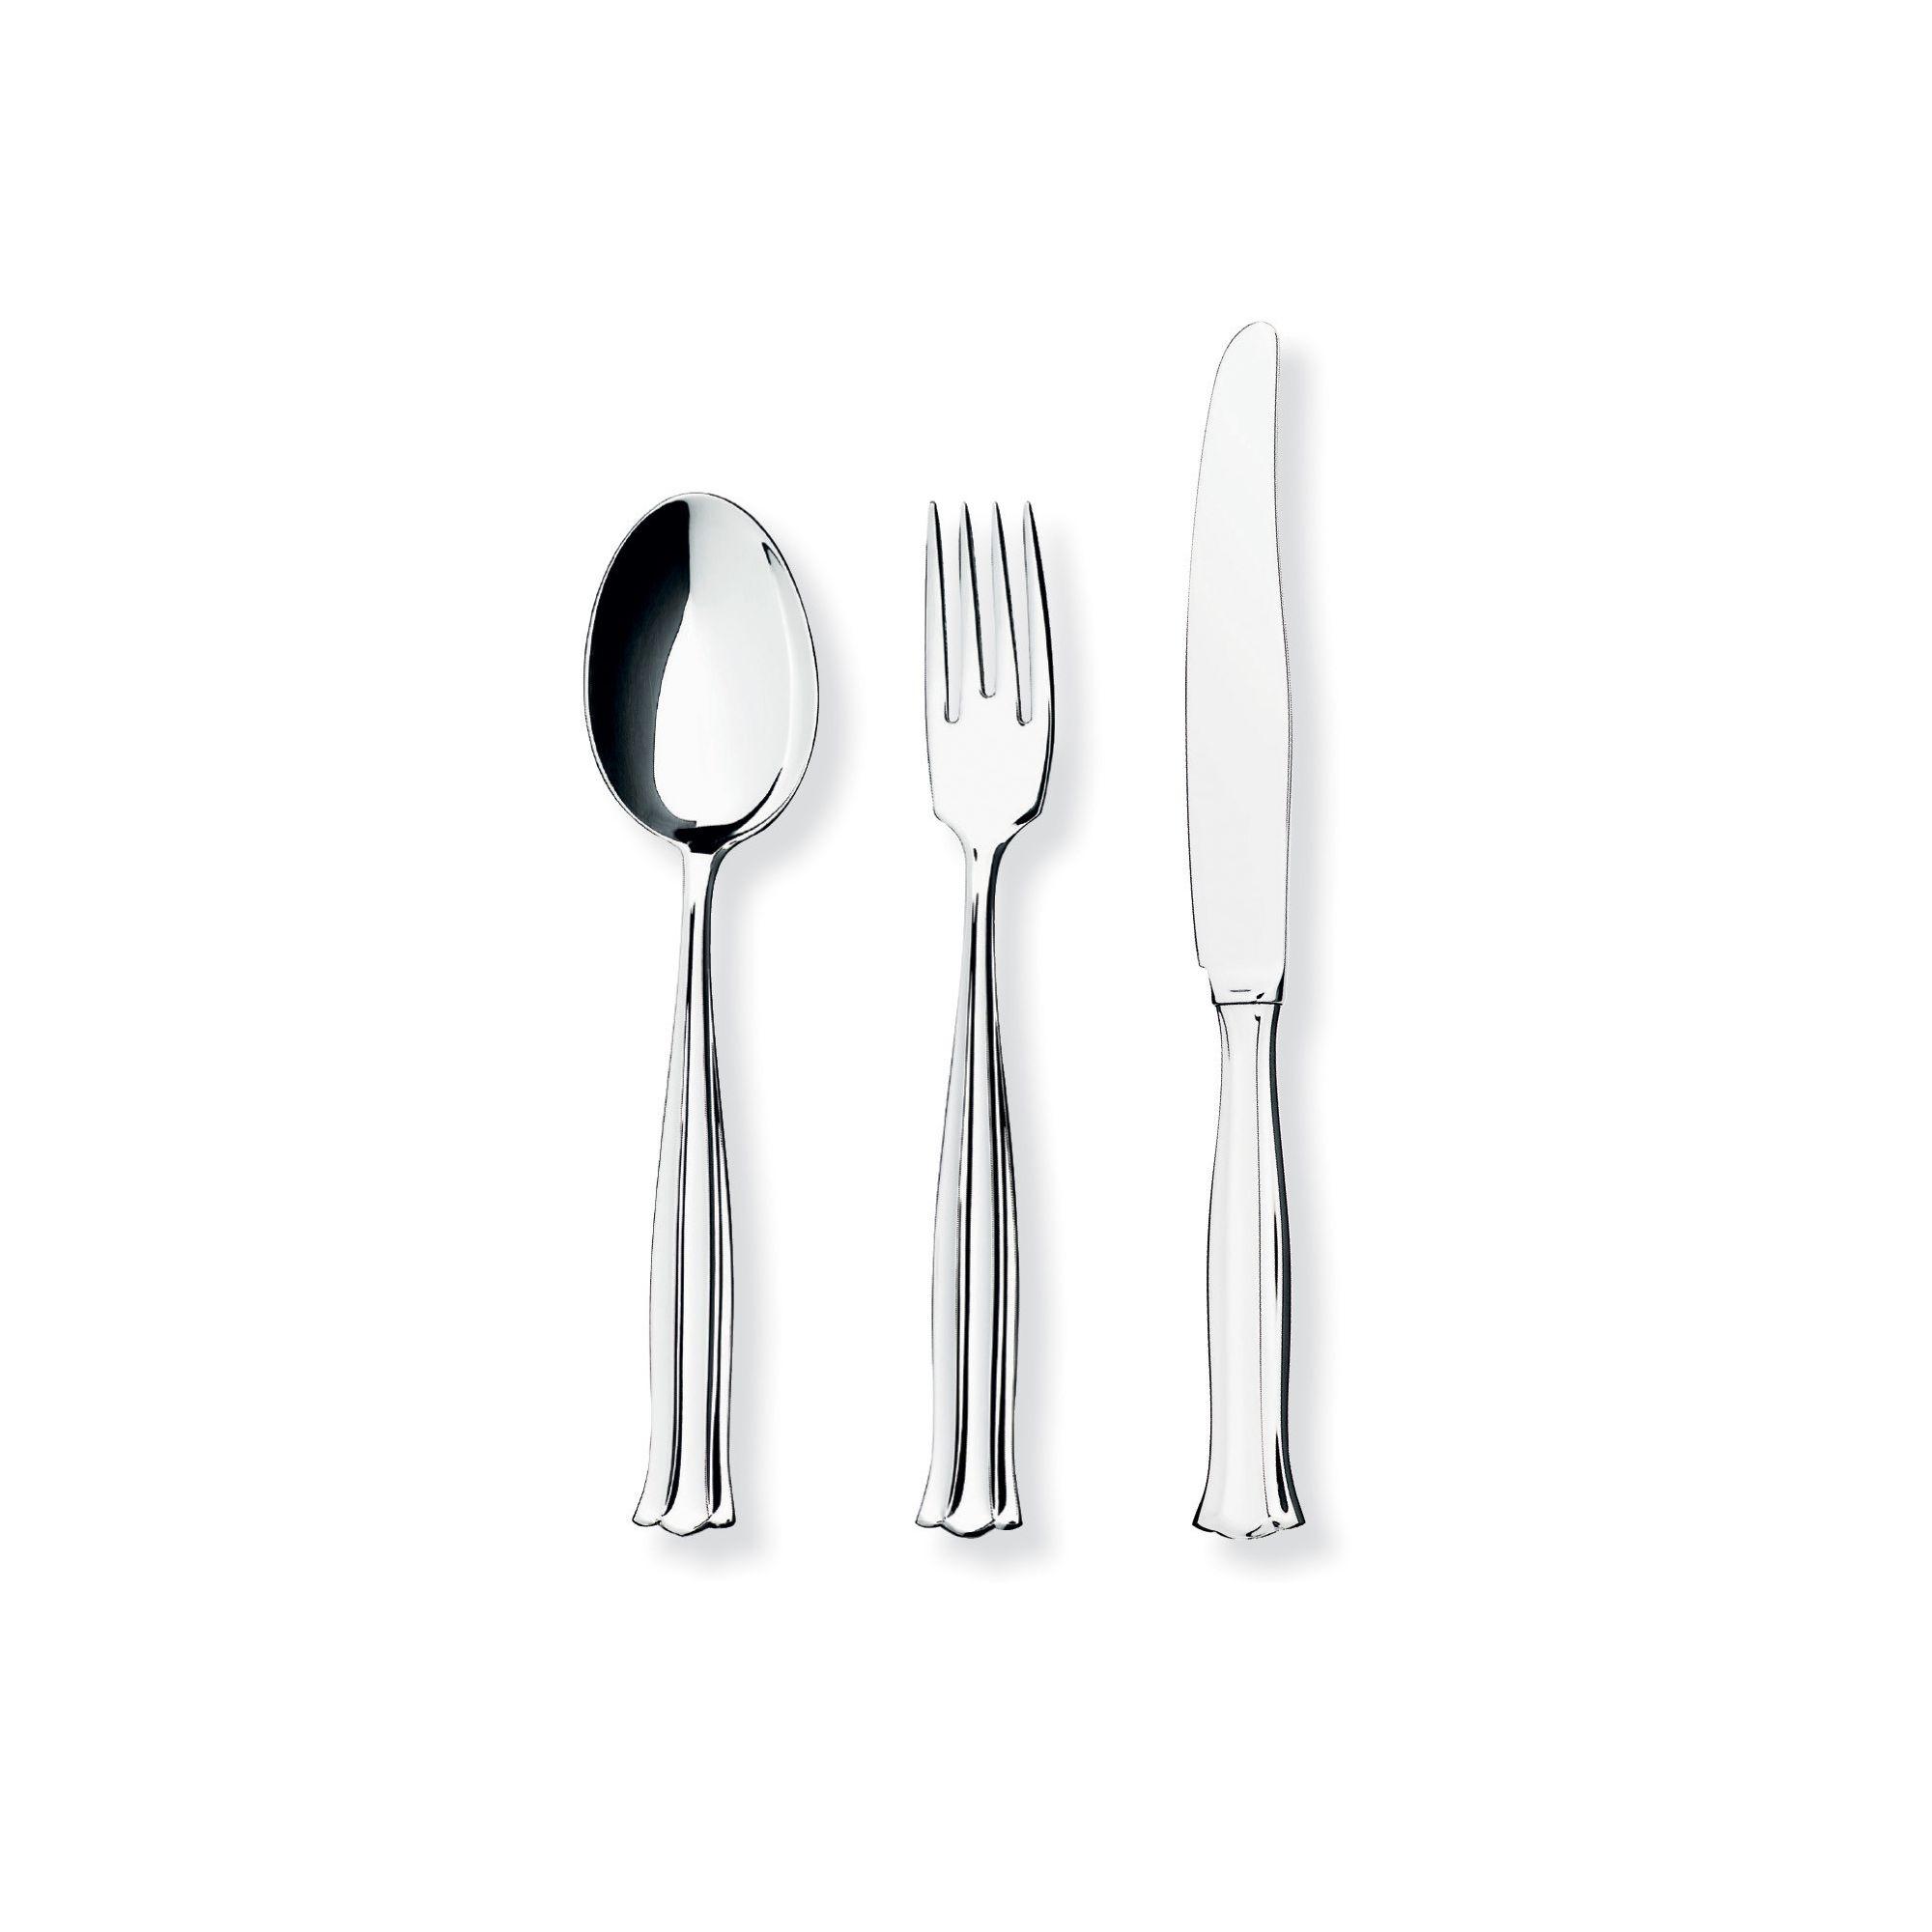 Mema/GAB Birgitta 12 Piece Silver Plated Cutlery Set 4 at Tesco Direct